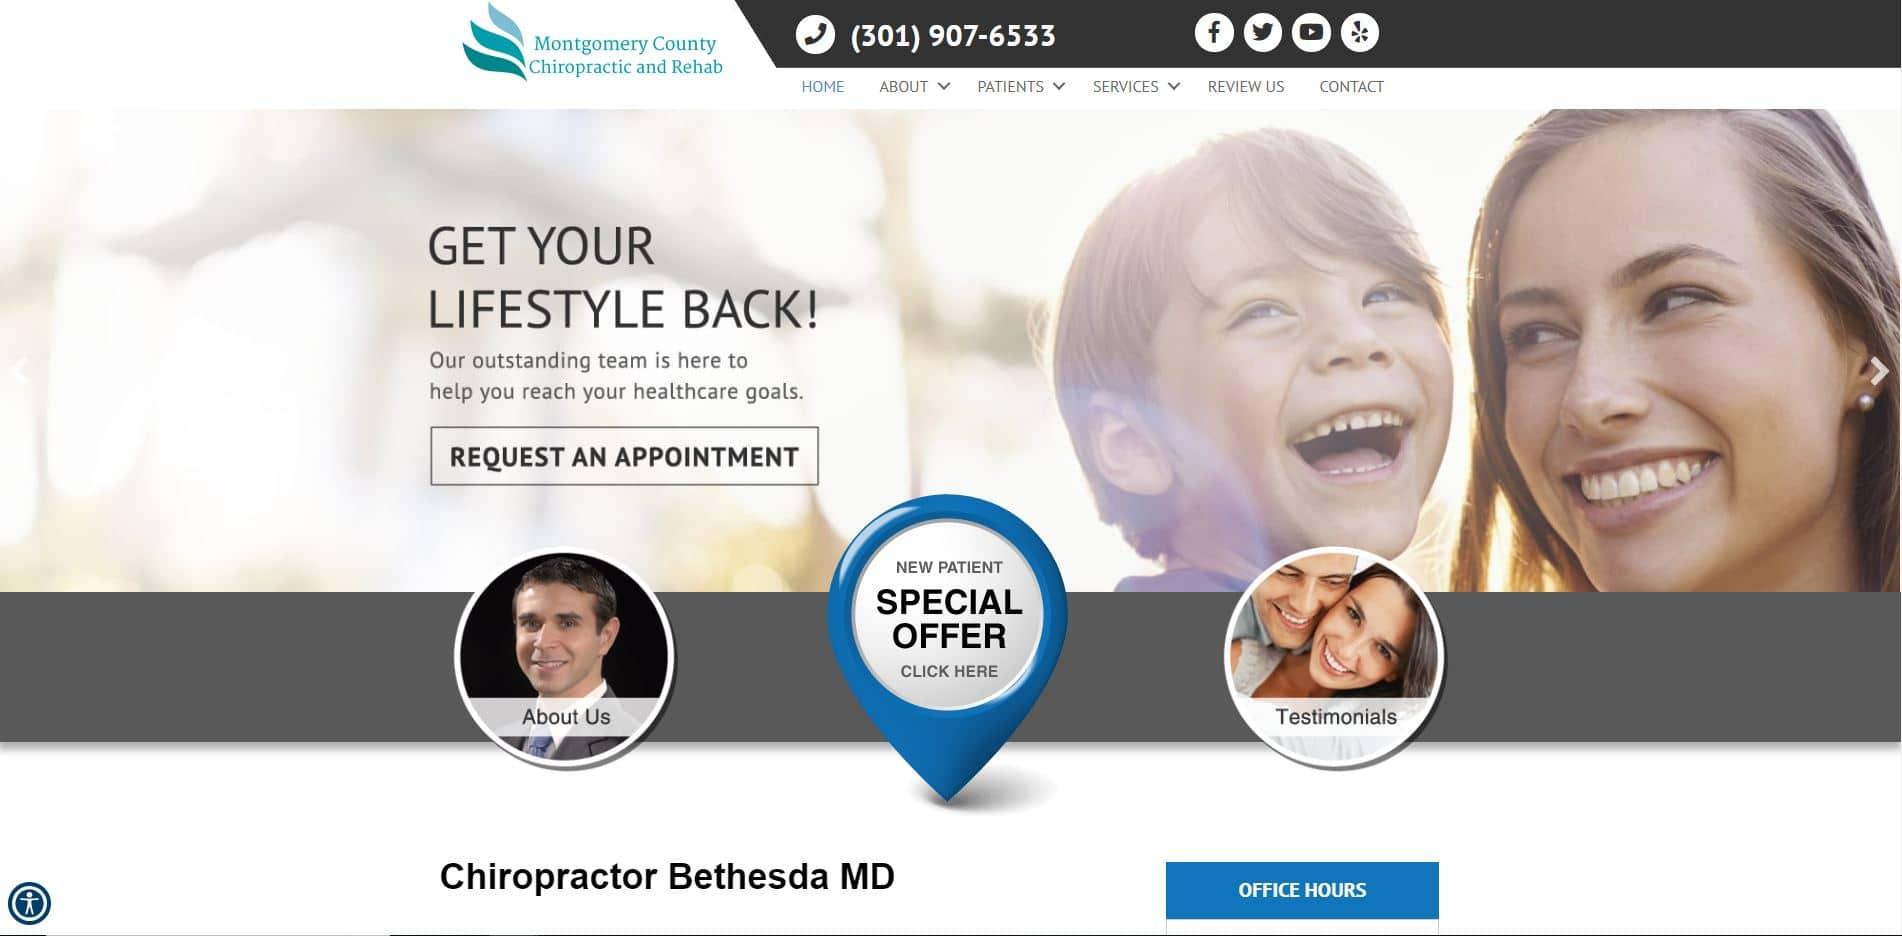 Chiropractor in Bethesda